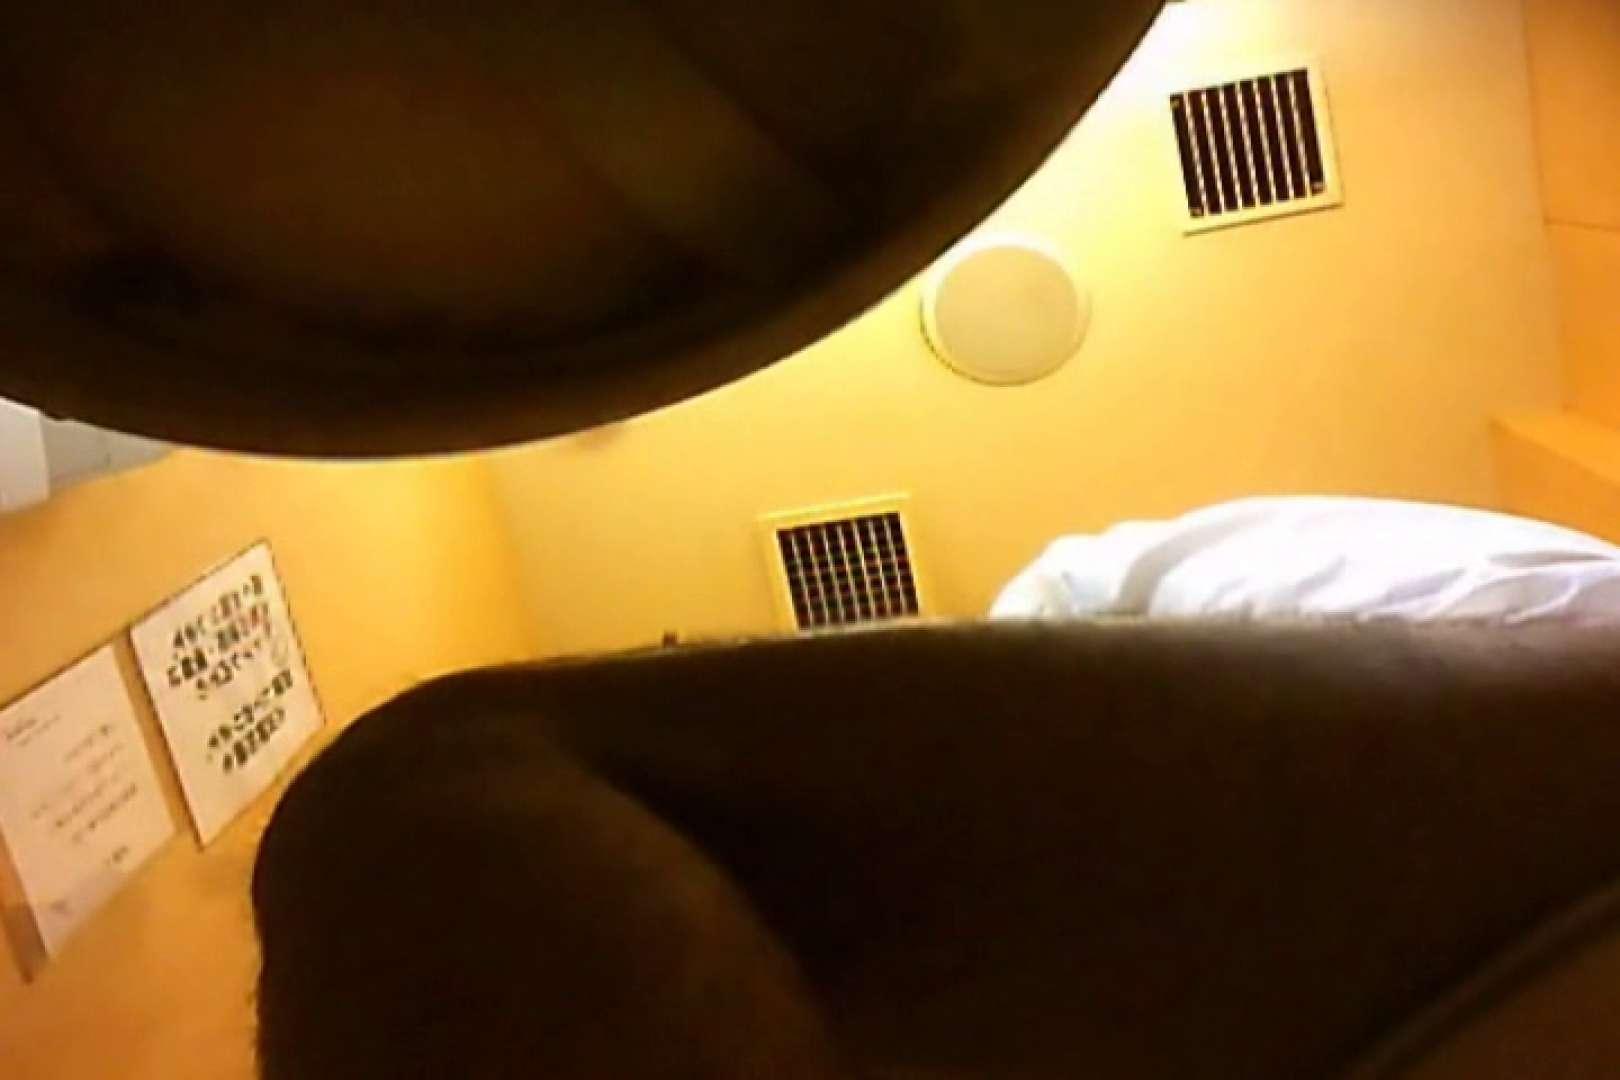 SEASON 3rd!掴み取りさんの洗面所覗き!in新幹線!VOL.22 スーツボーイズ | リーマン系ボーイズ  71pic 67